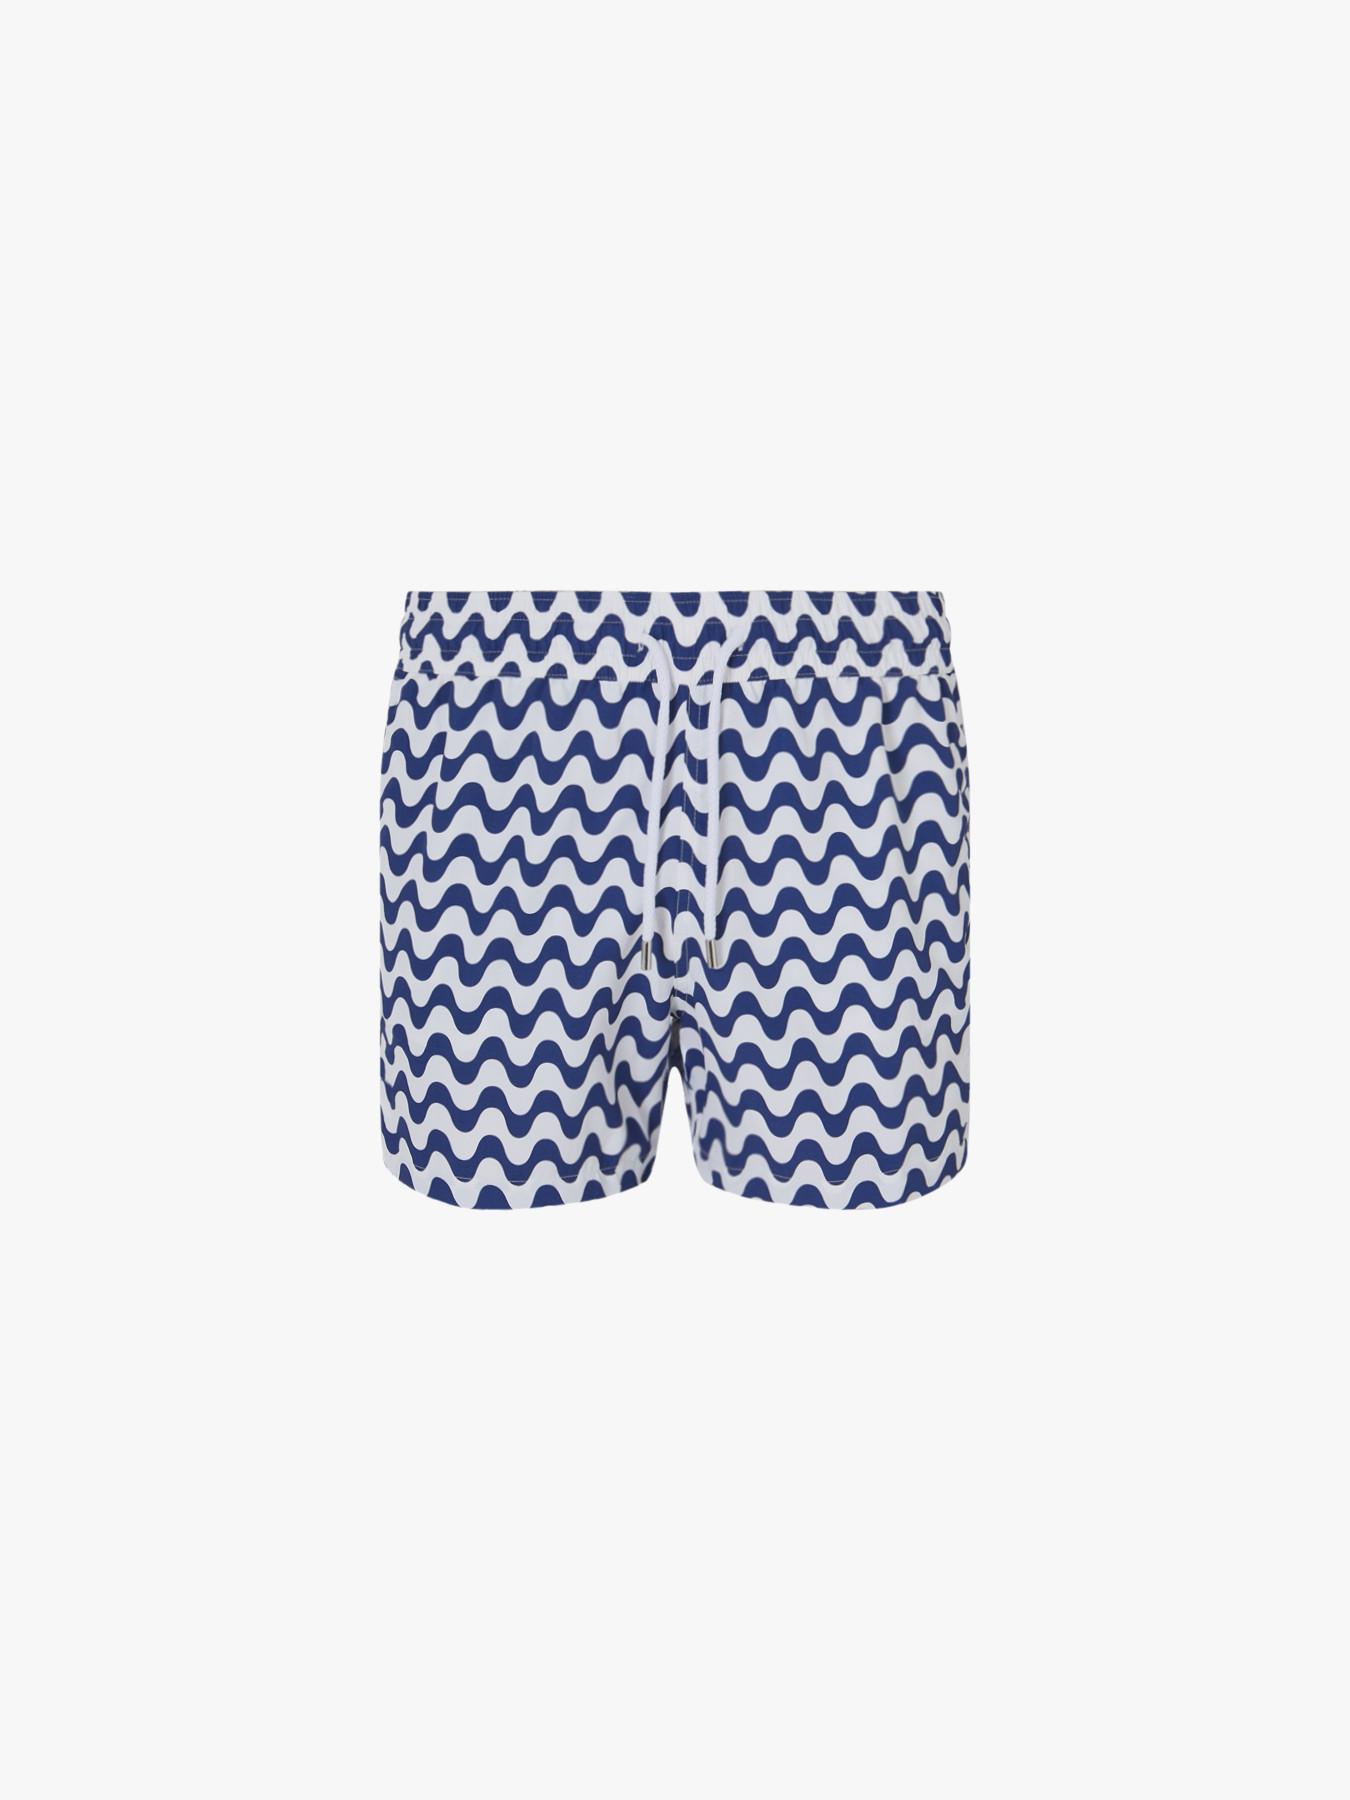 0f7c0520ede Frescobol Carioca Copacabana Sport Swim Shorts | Trunks | Fenwick